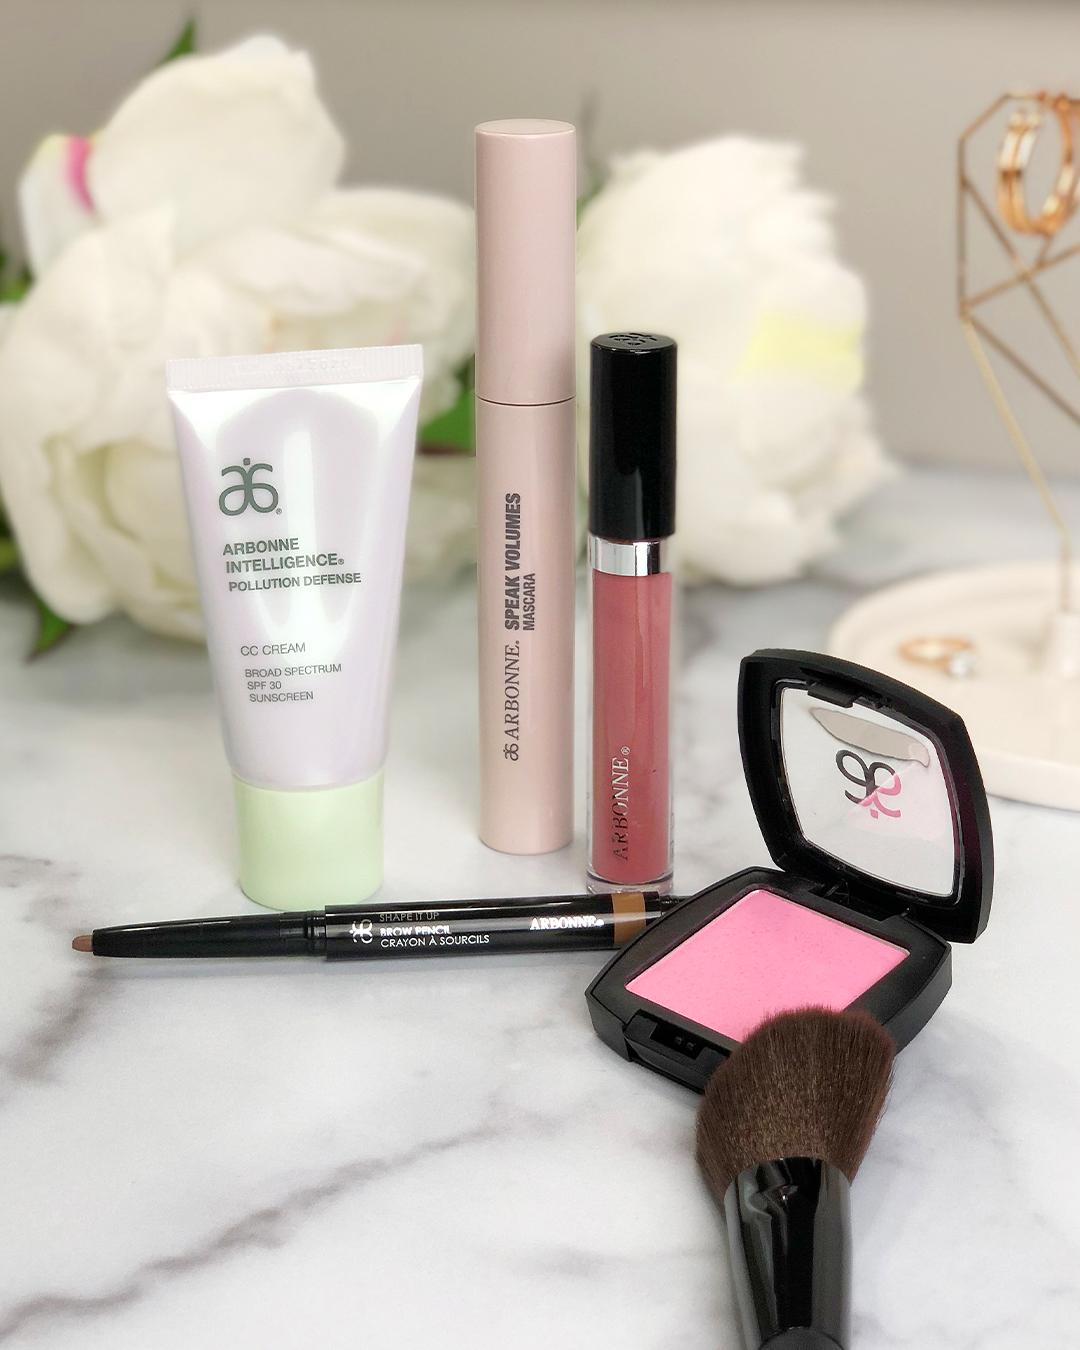 arbonne, Arbonne makeup, ready in five, Arbonne ready in five, makeup